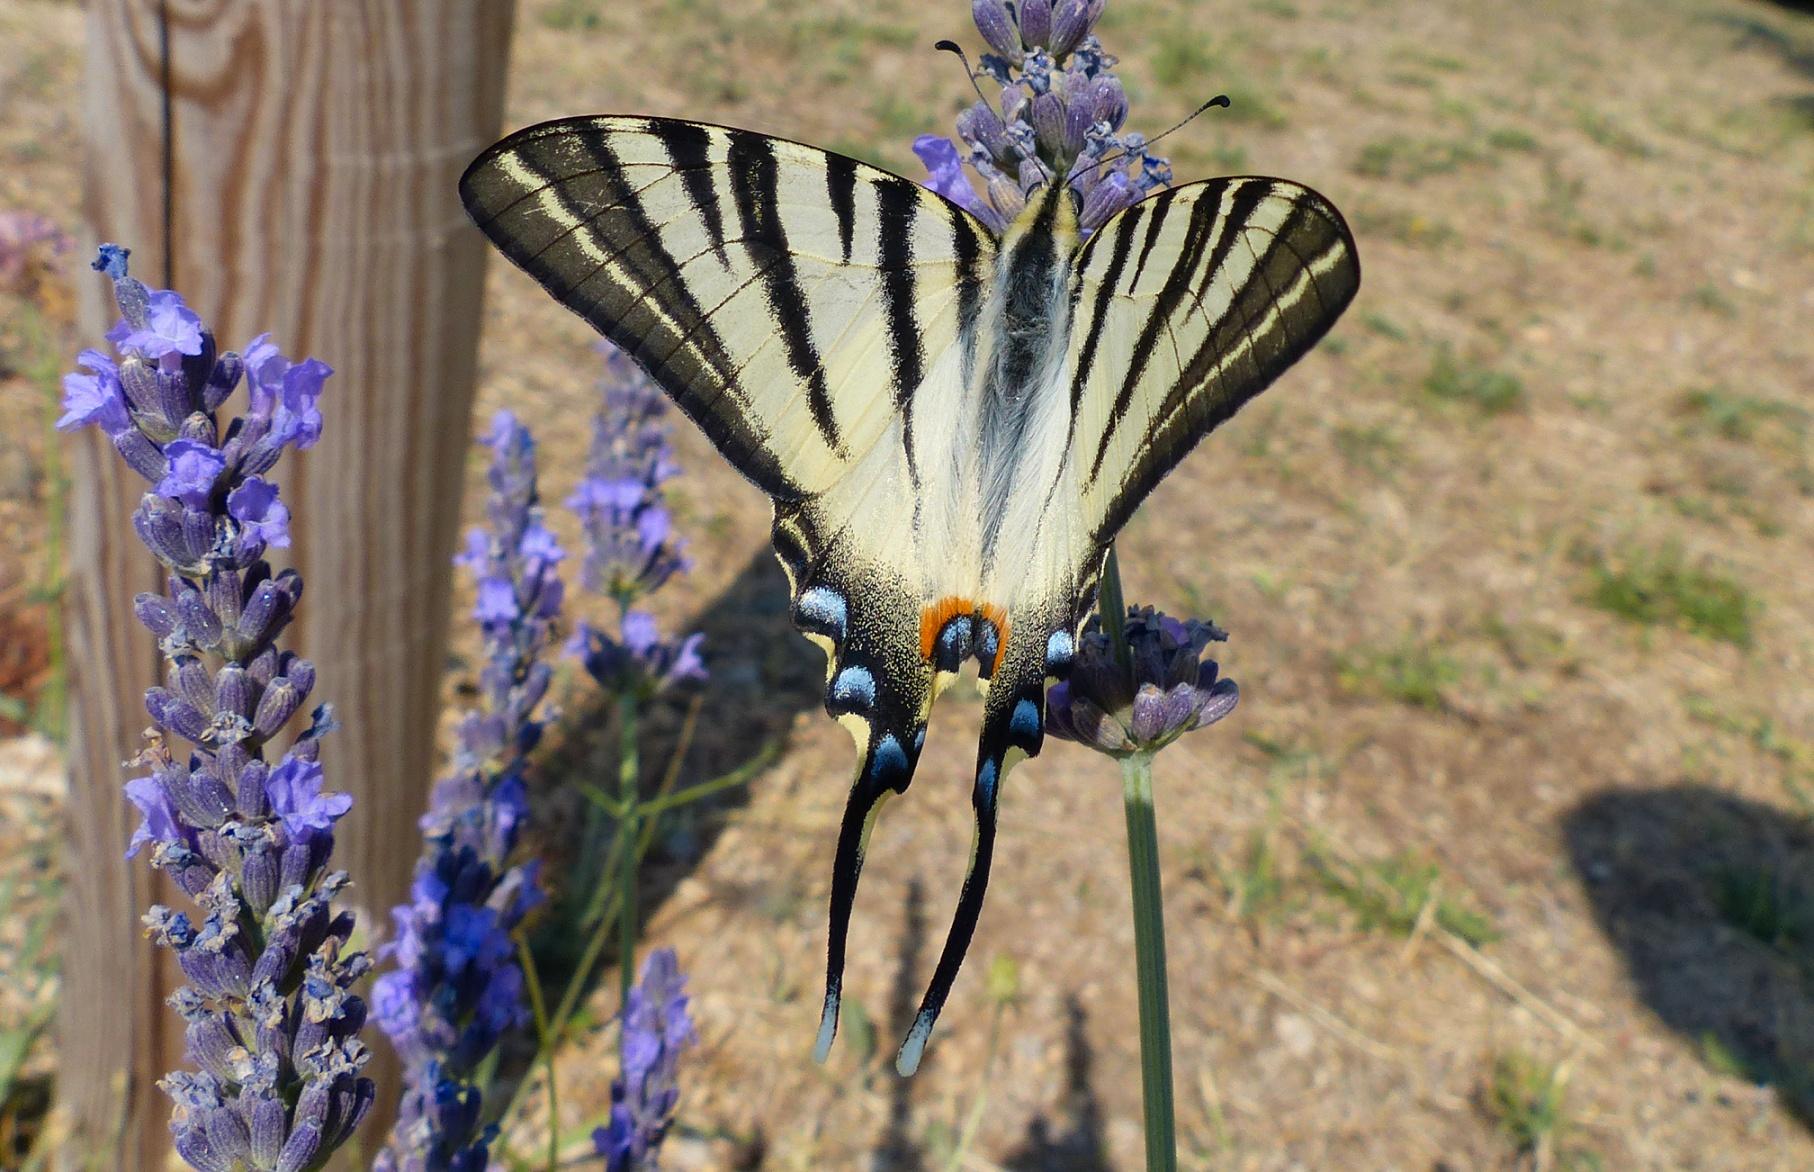 http://ekladata.com/Cp1ONdnlWxCmJPwR8oanj0L9yto/saint-jurs-papillon-flambe.jpg